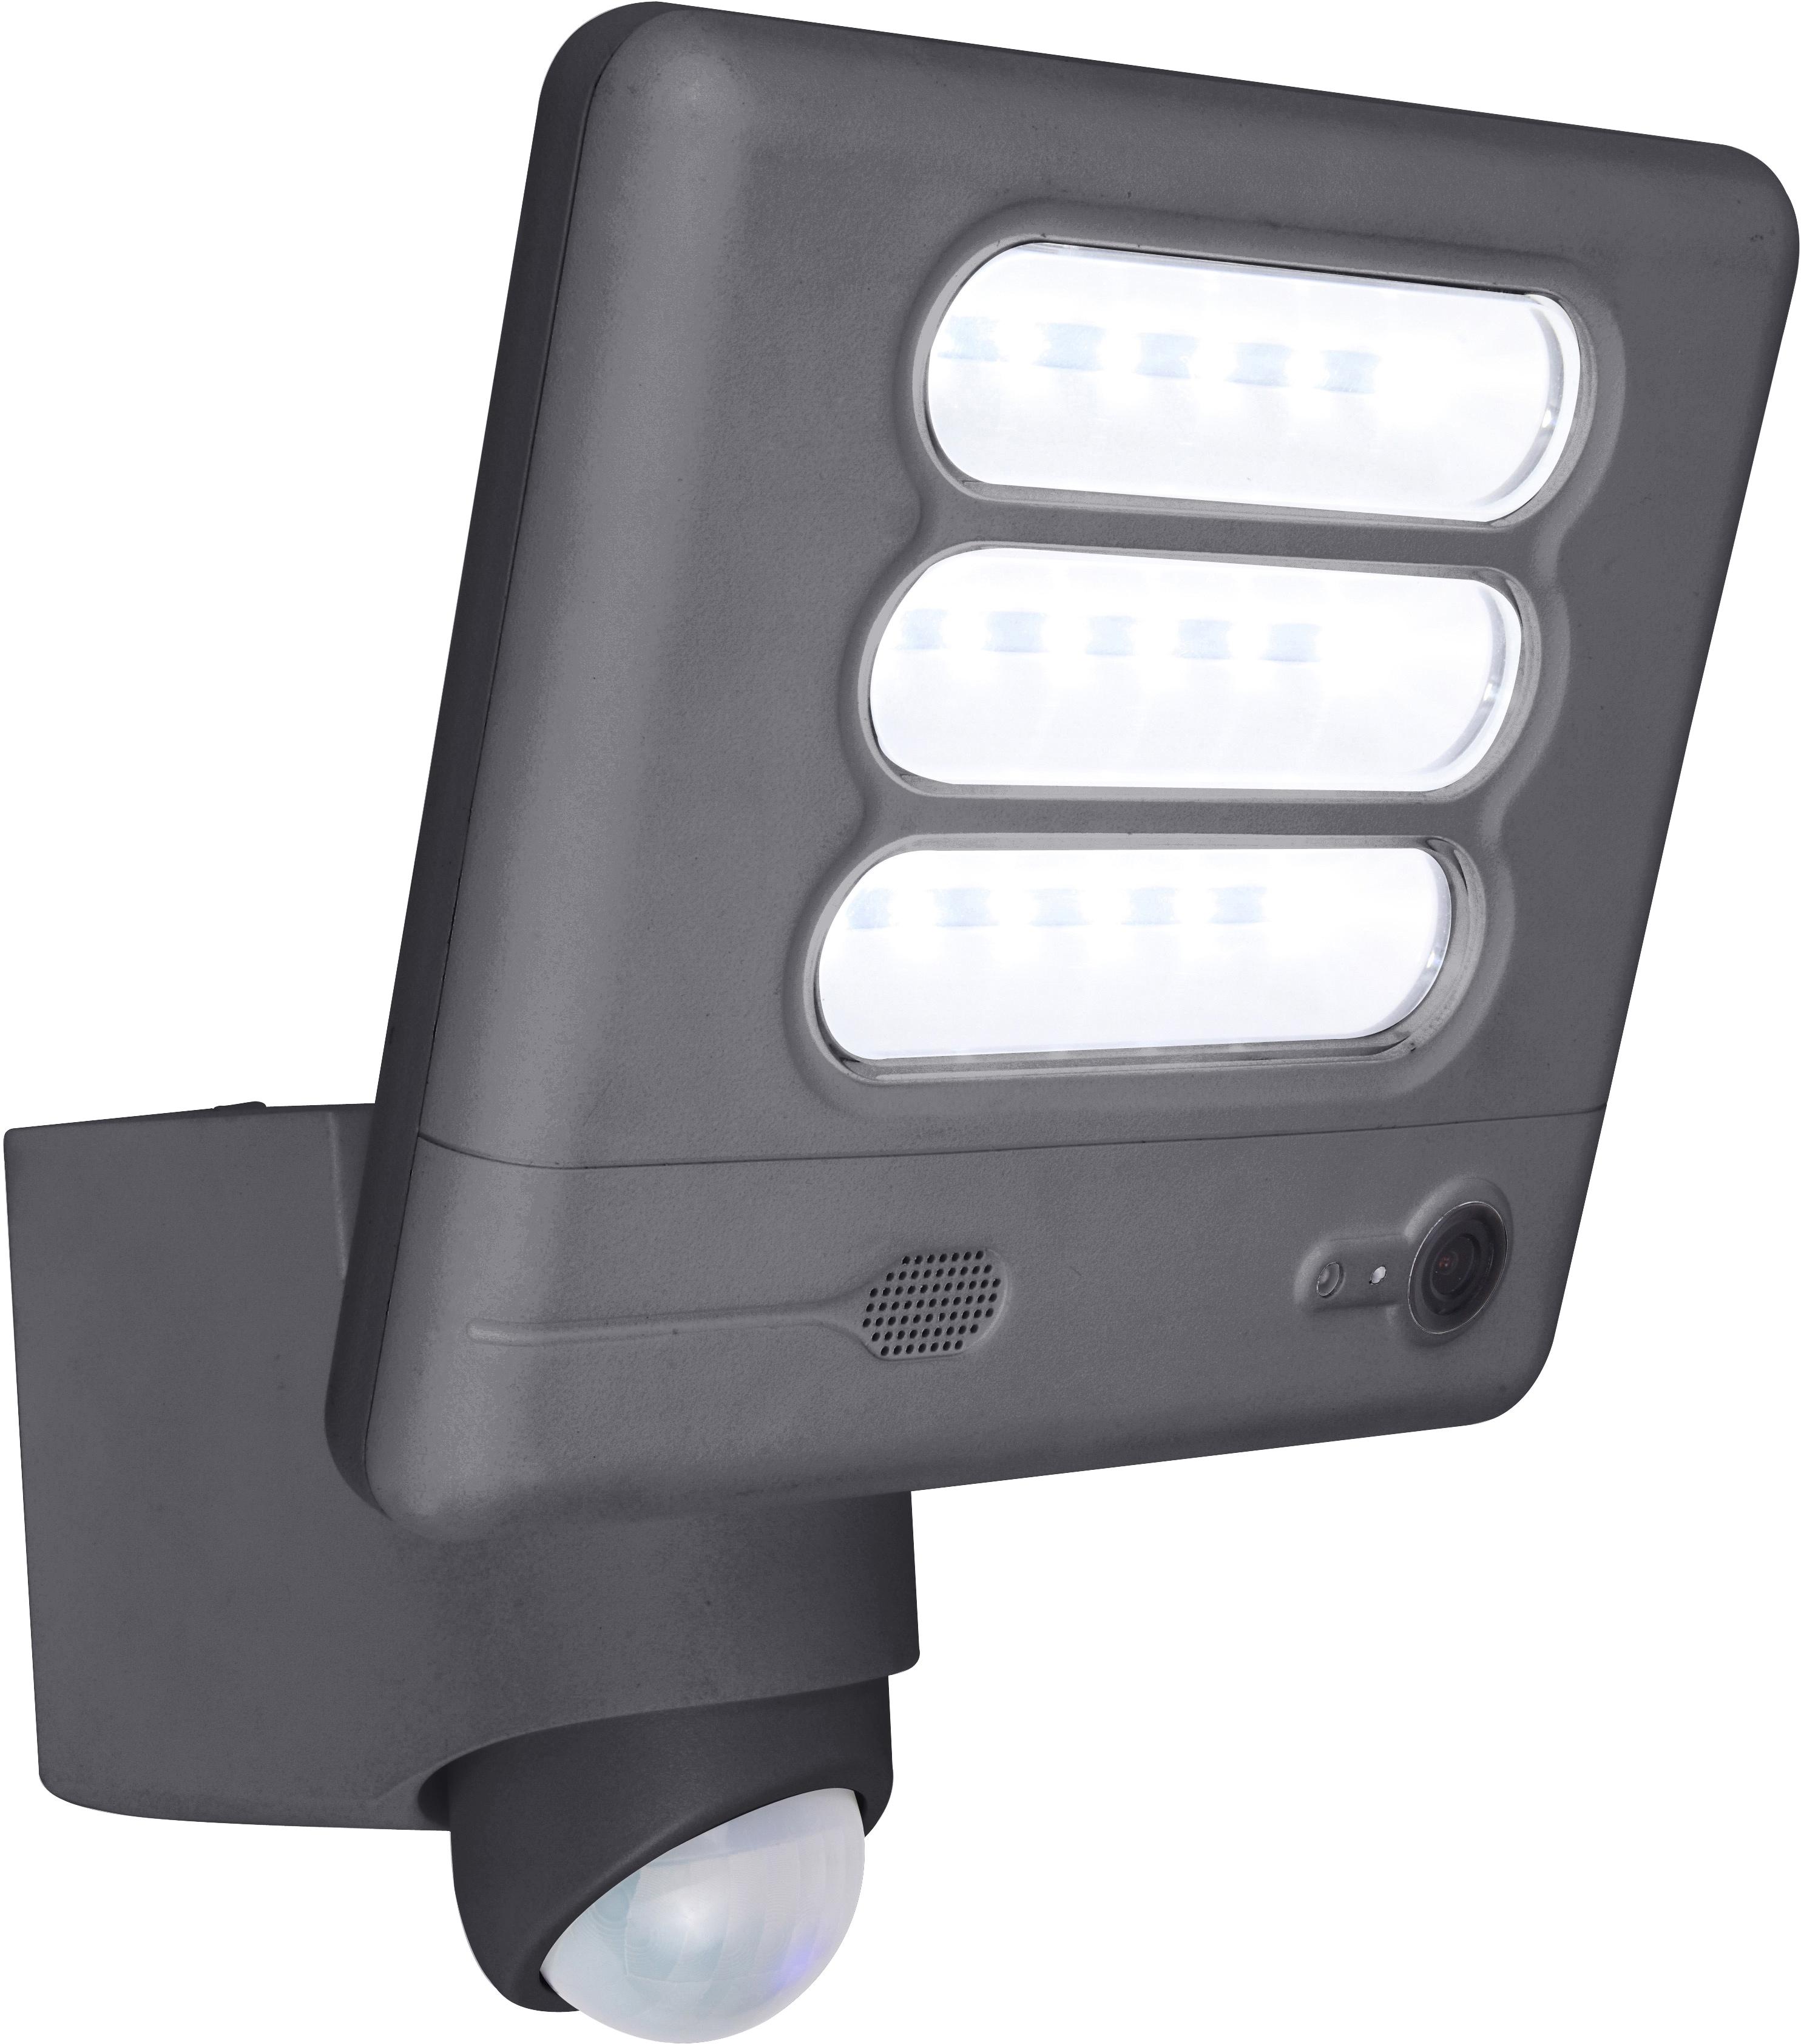 LUTEC LED Außen-Wandleuchte ESA HD 6255-CAM GR, LED-Modul, 1 St., Neutralweiß, Kameraleuchte